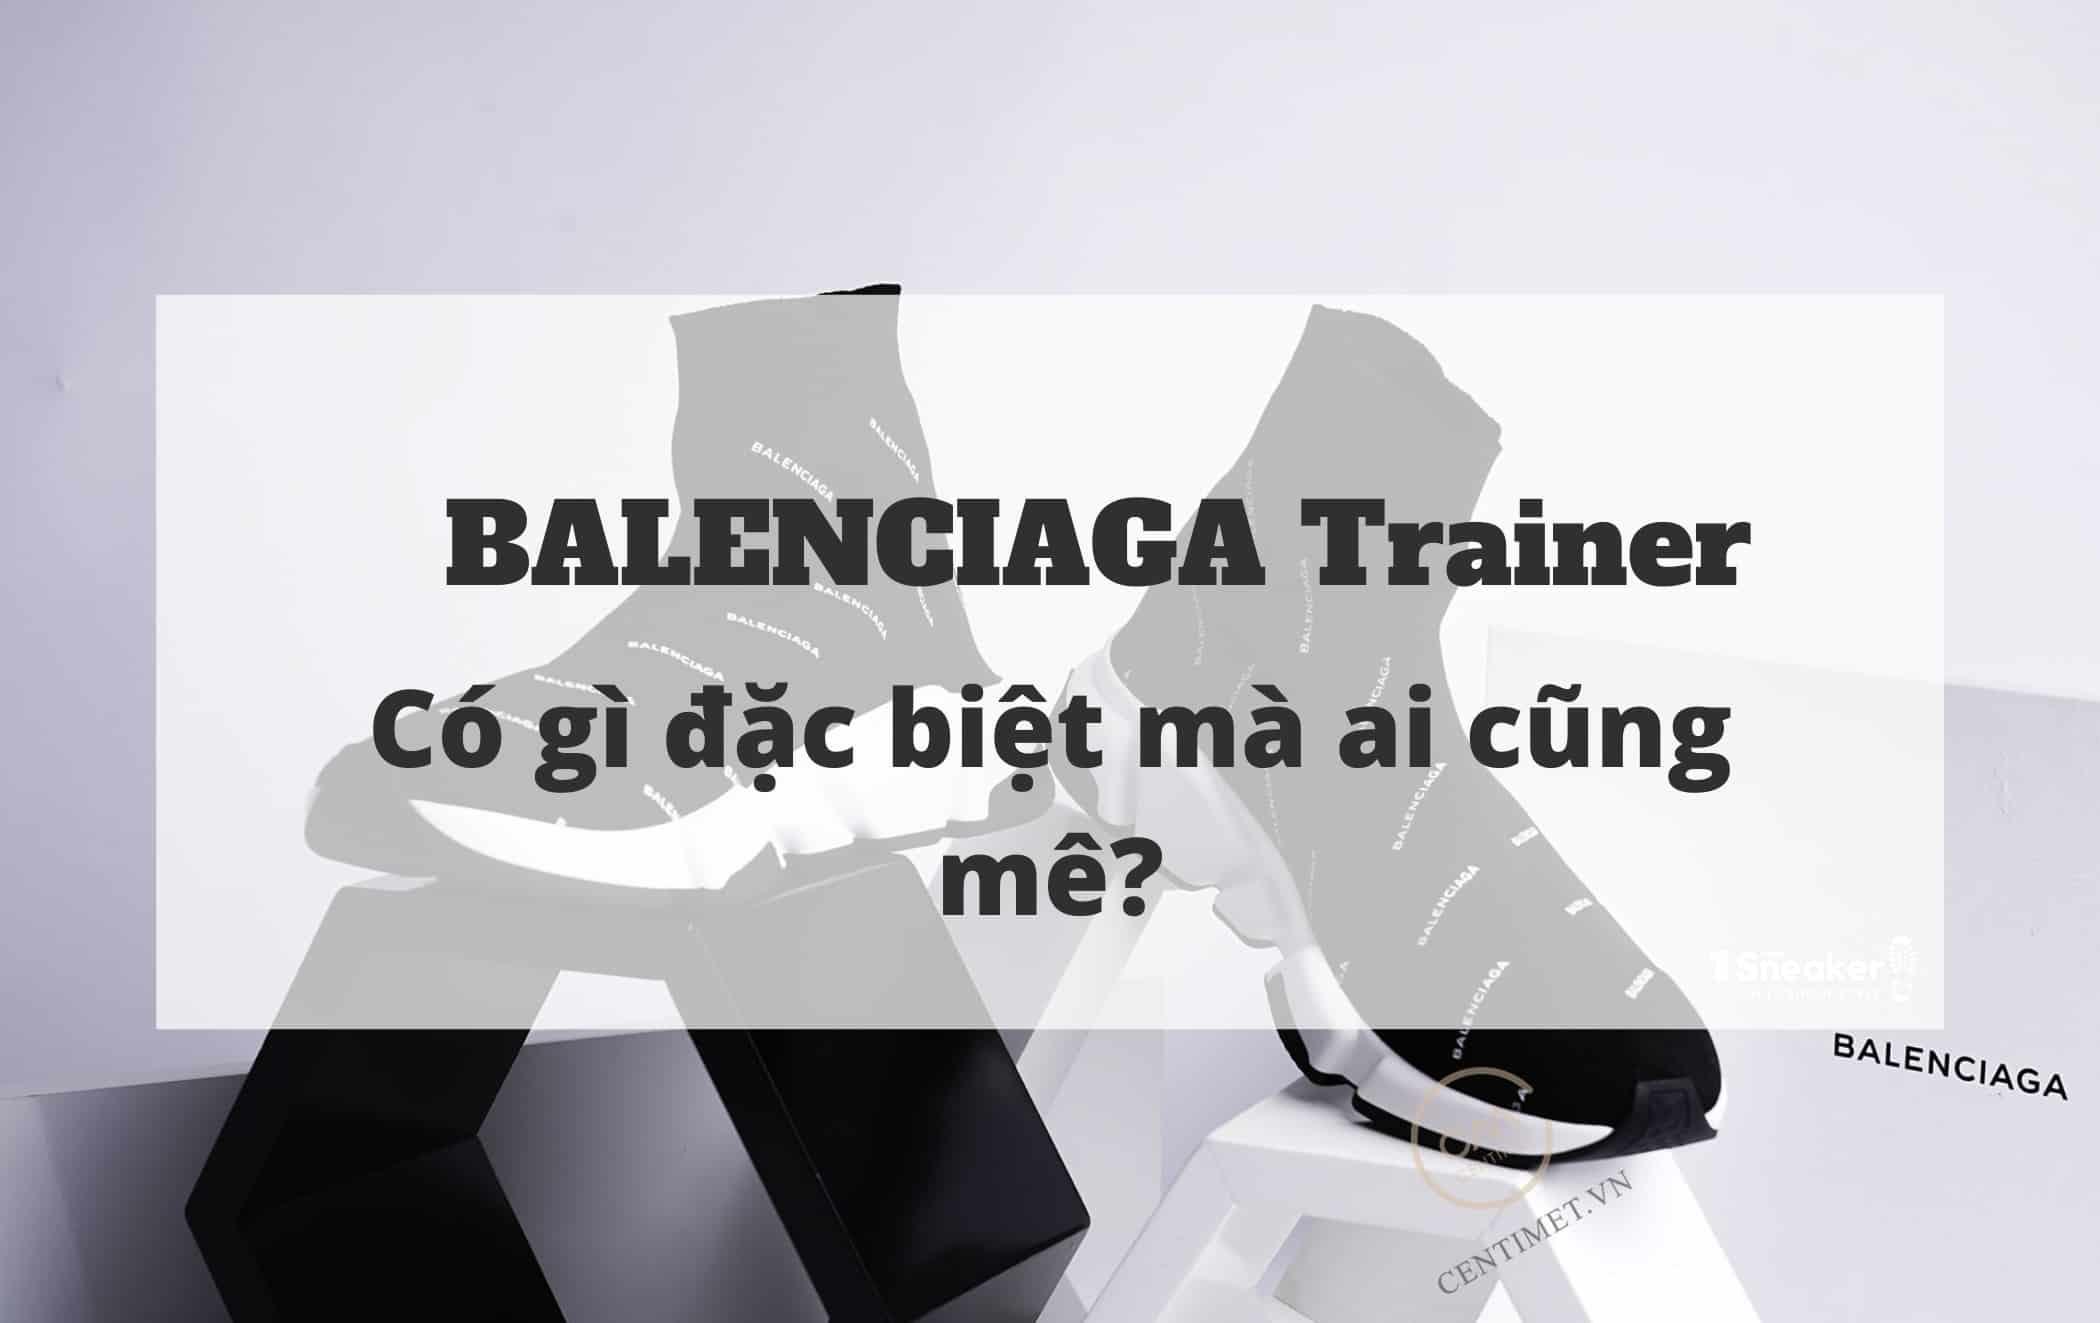 BALENCIAGA Trainer